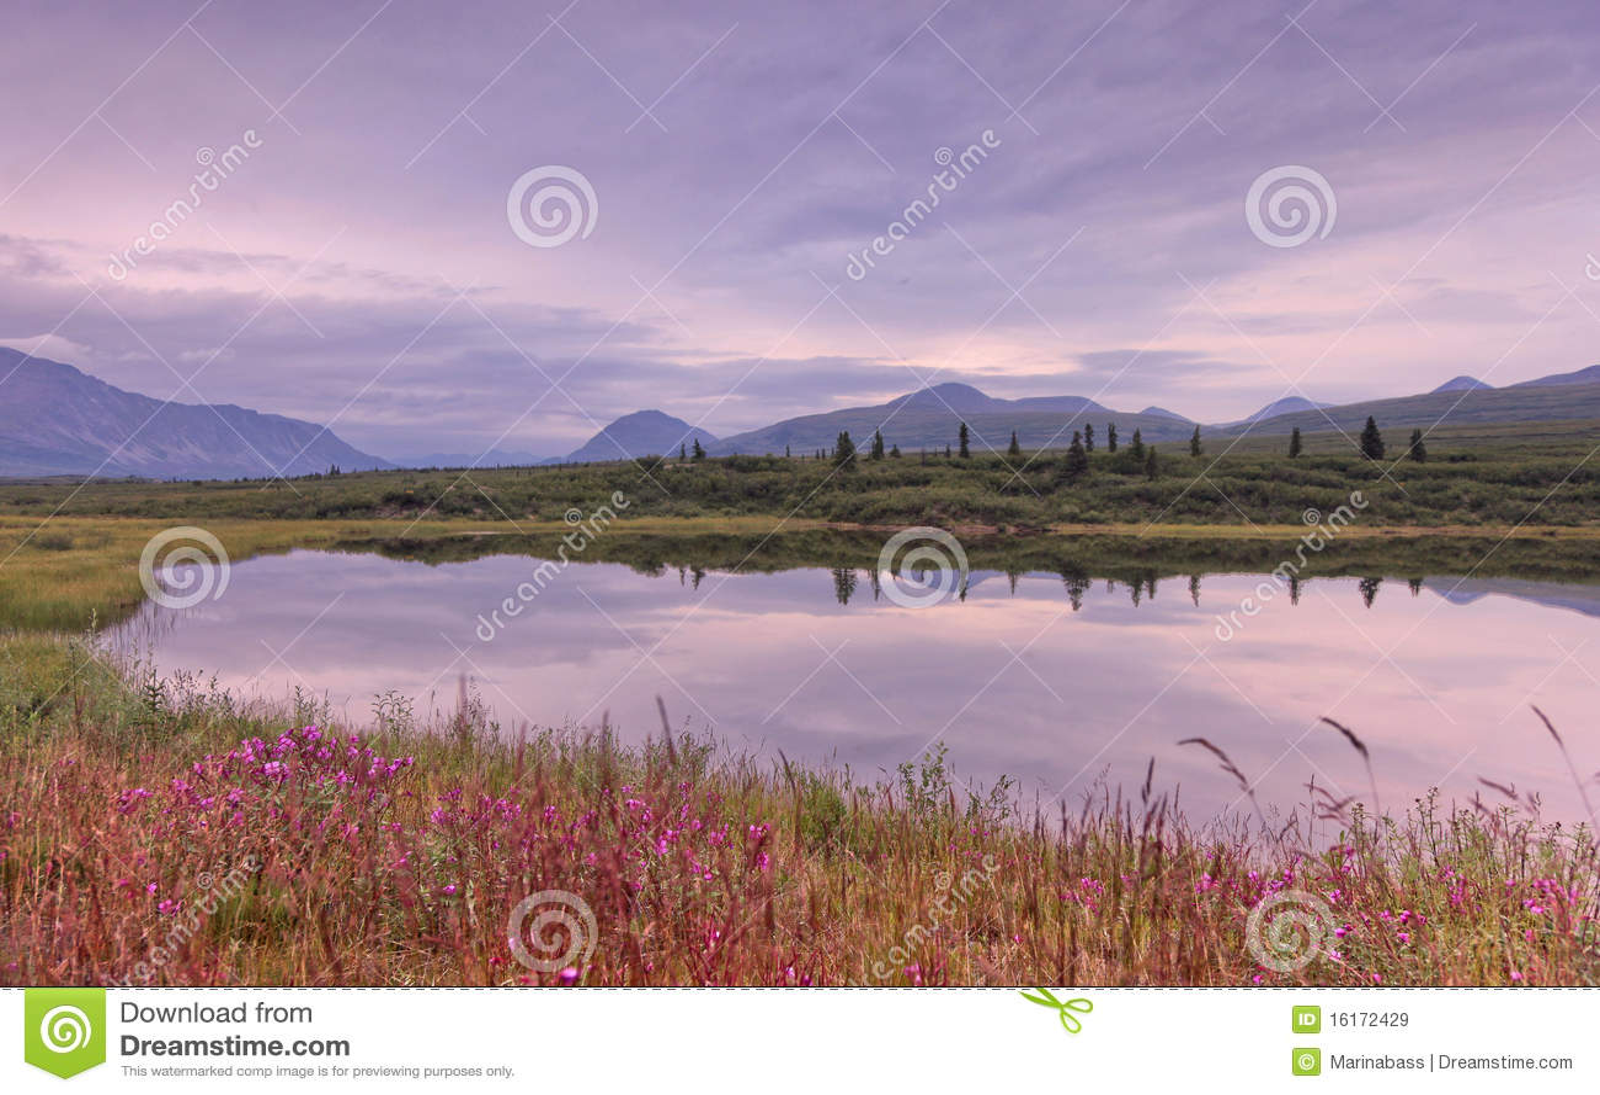 Alaska: Mountan Lake Reflection